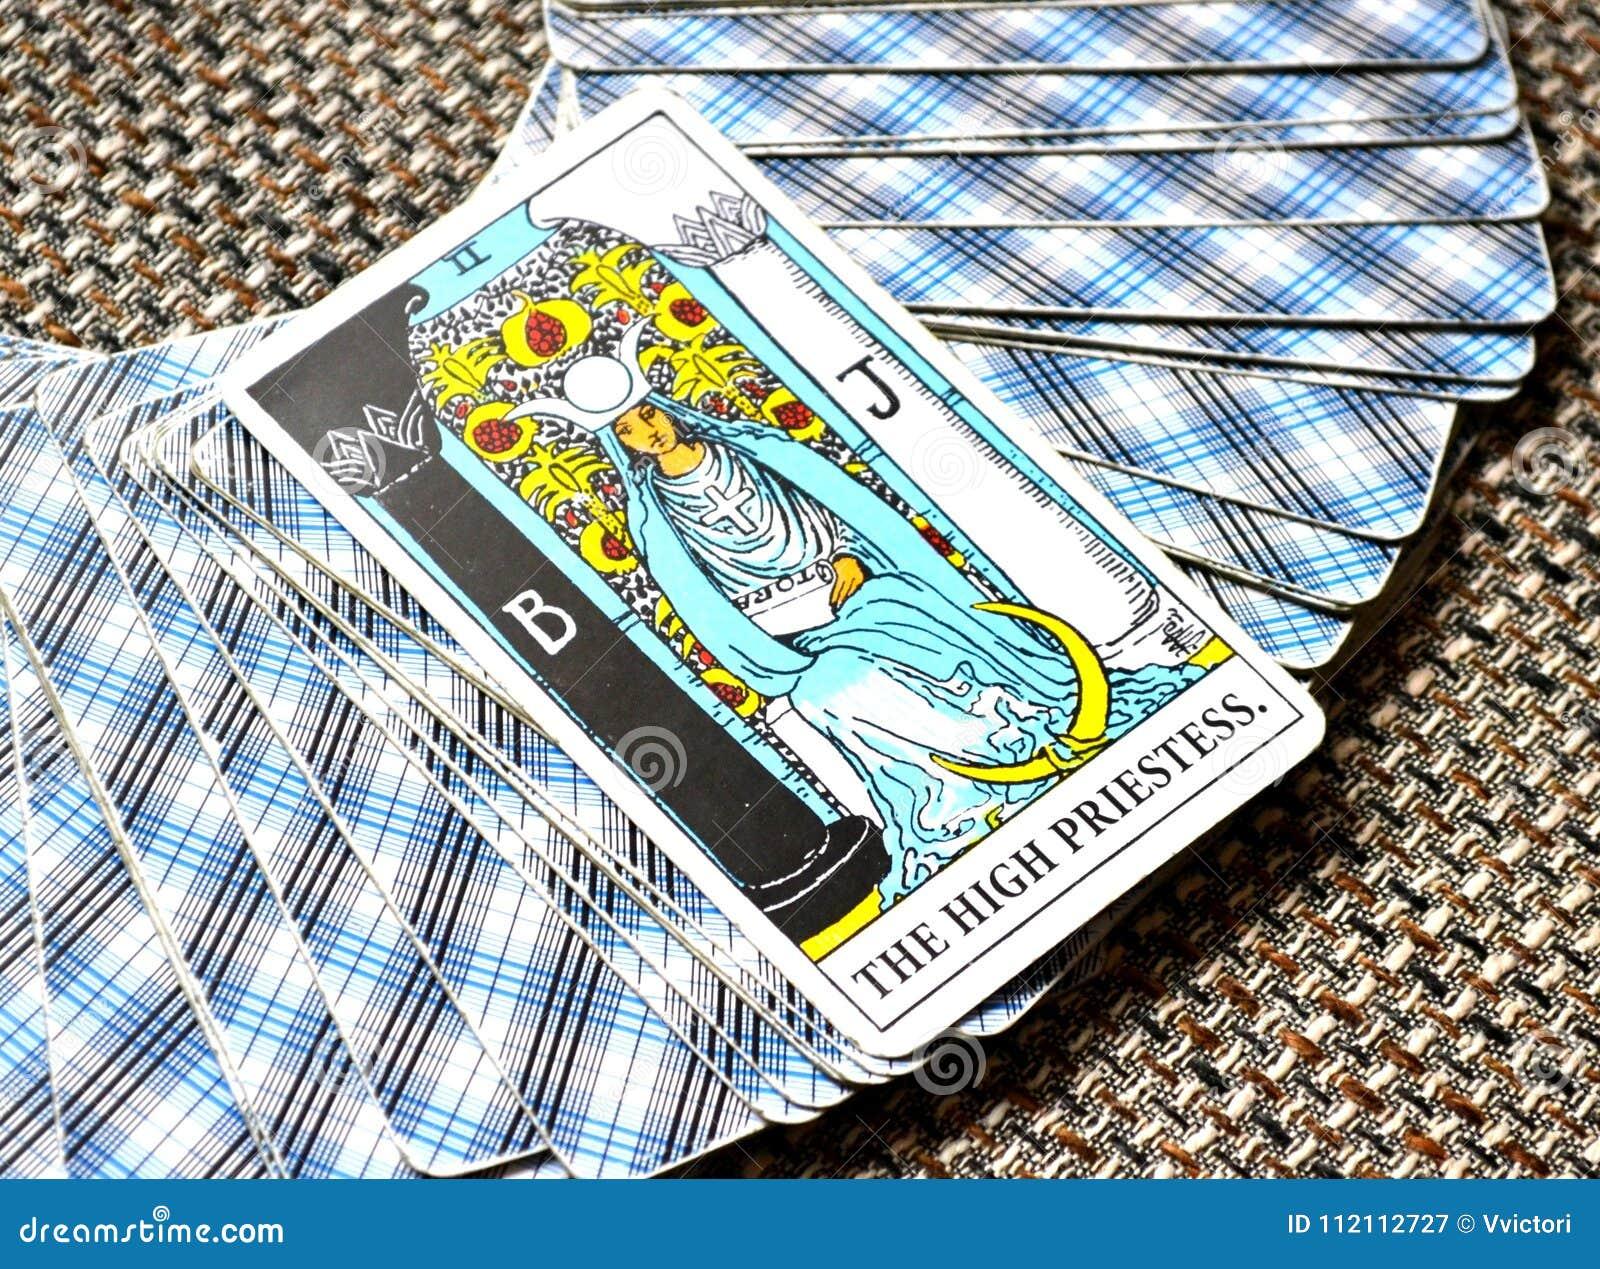 The High Priestess Tarot Card Subconscious, Higher-Self